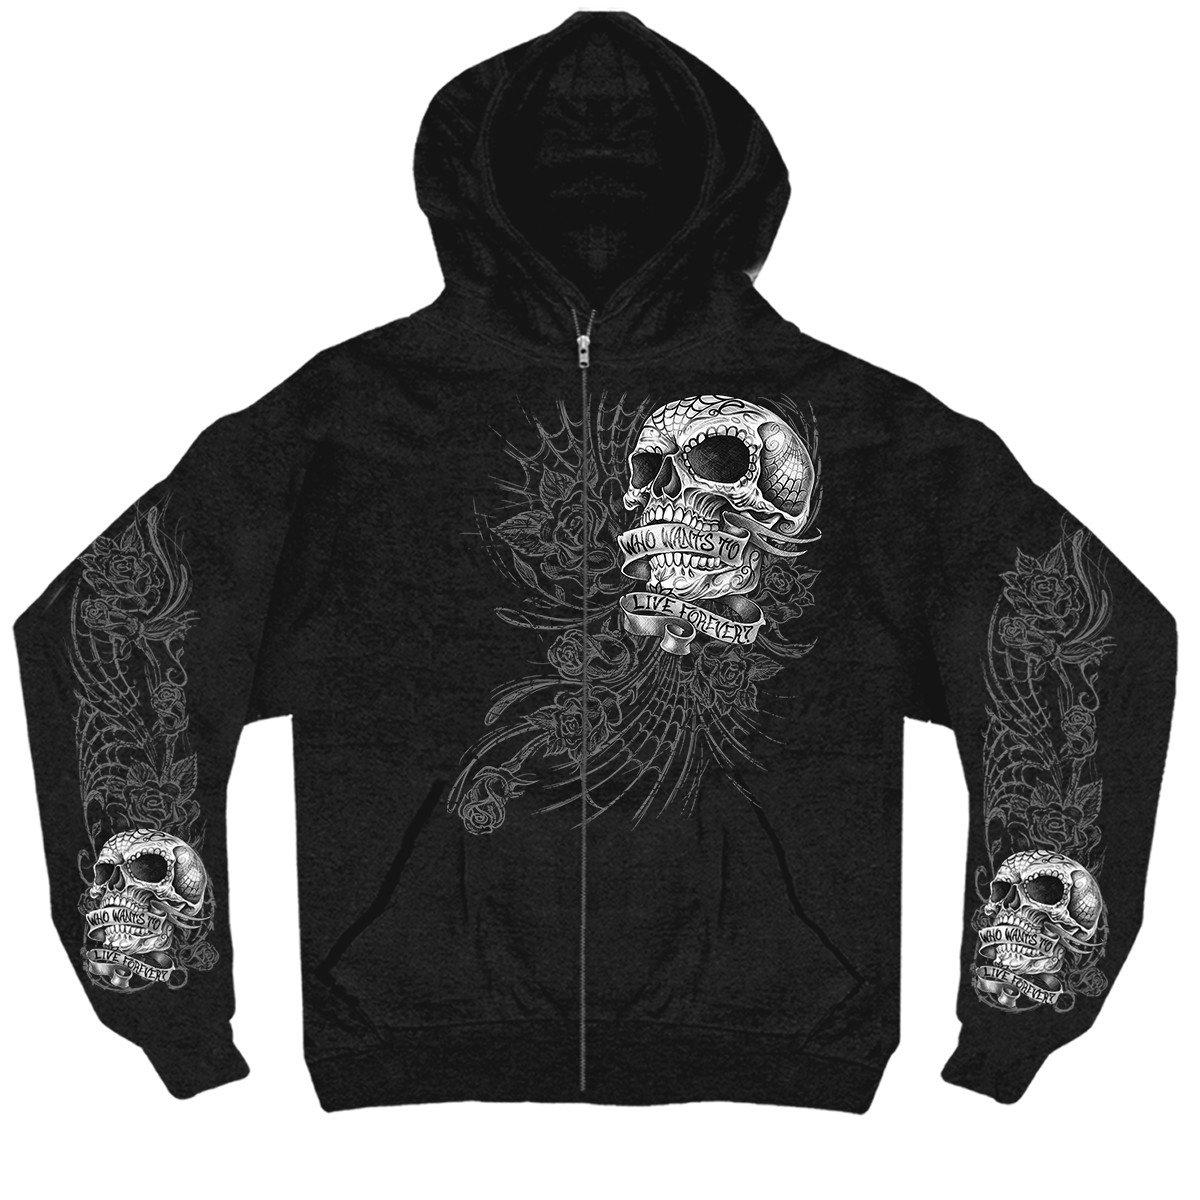 Hot Leathers Mens Sweet Demise Zip Up Hooded Sweat Shirt 12844 Black, XXX-Large